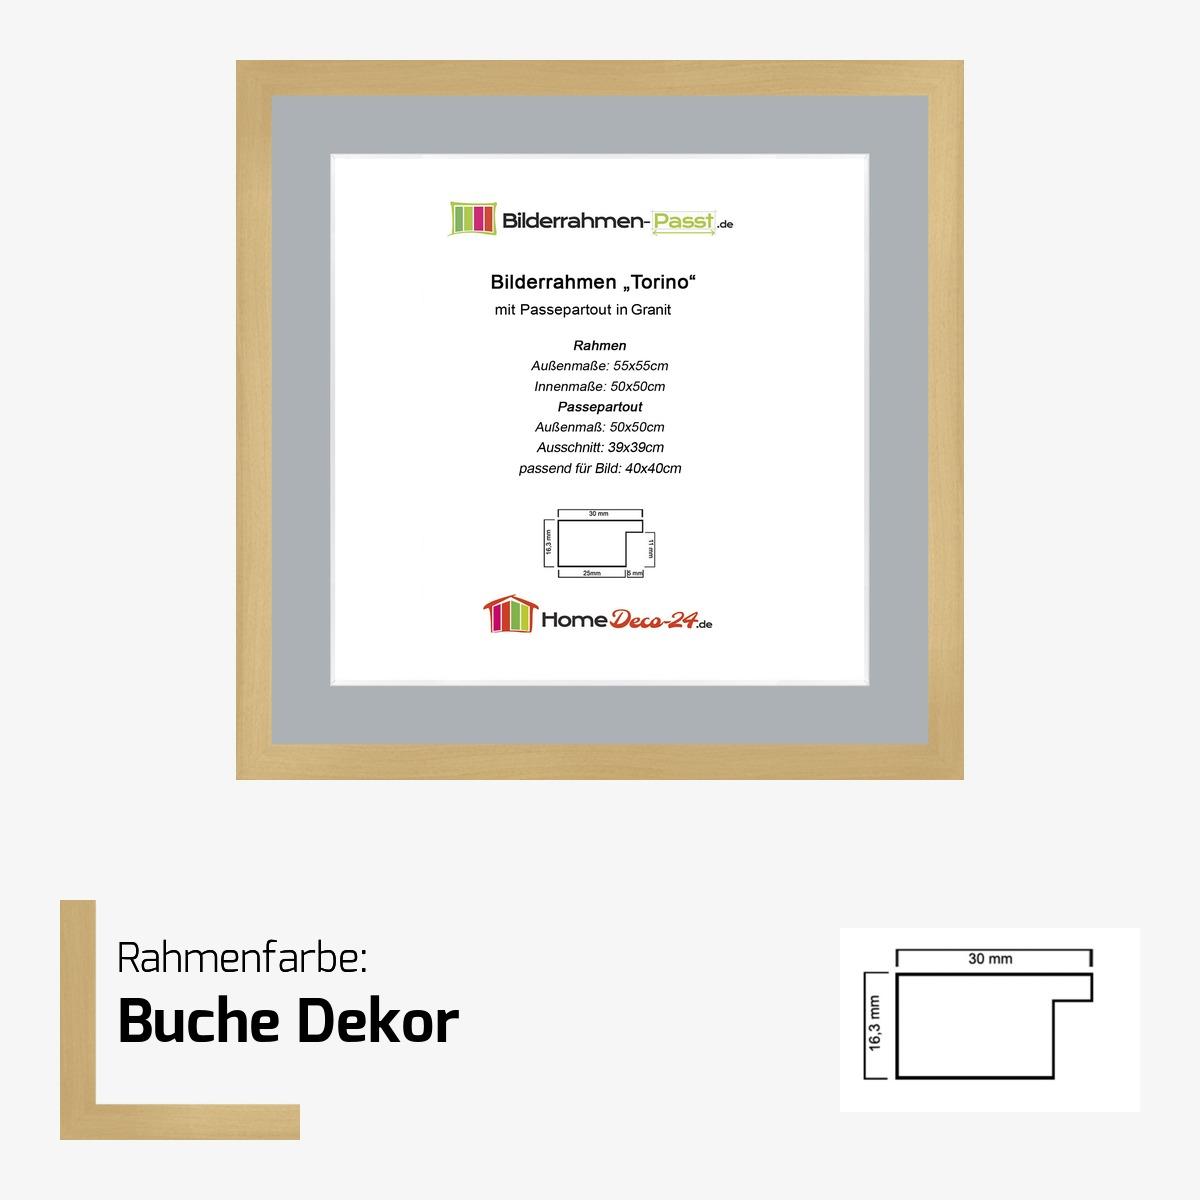 bilderrahmen torino farbwahl 50x50 cm passepartout granit f bild 40x40 ebay. Black Bedroom Furniture Sets. Home Design Ideas